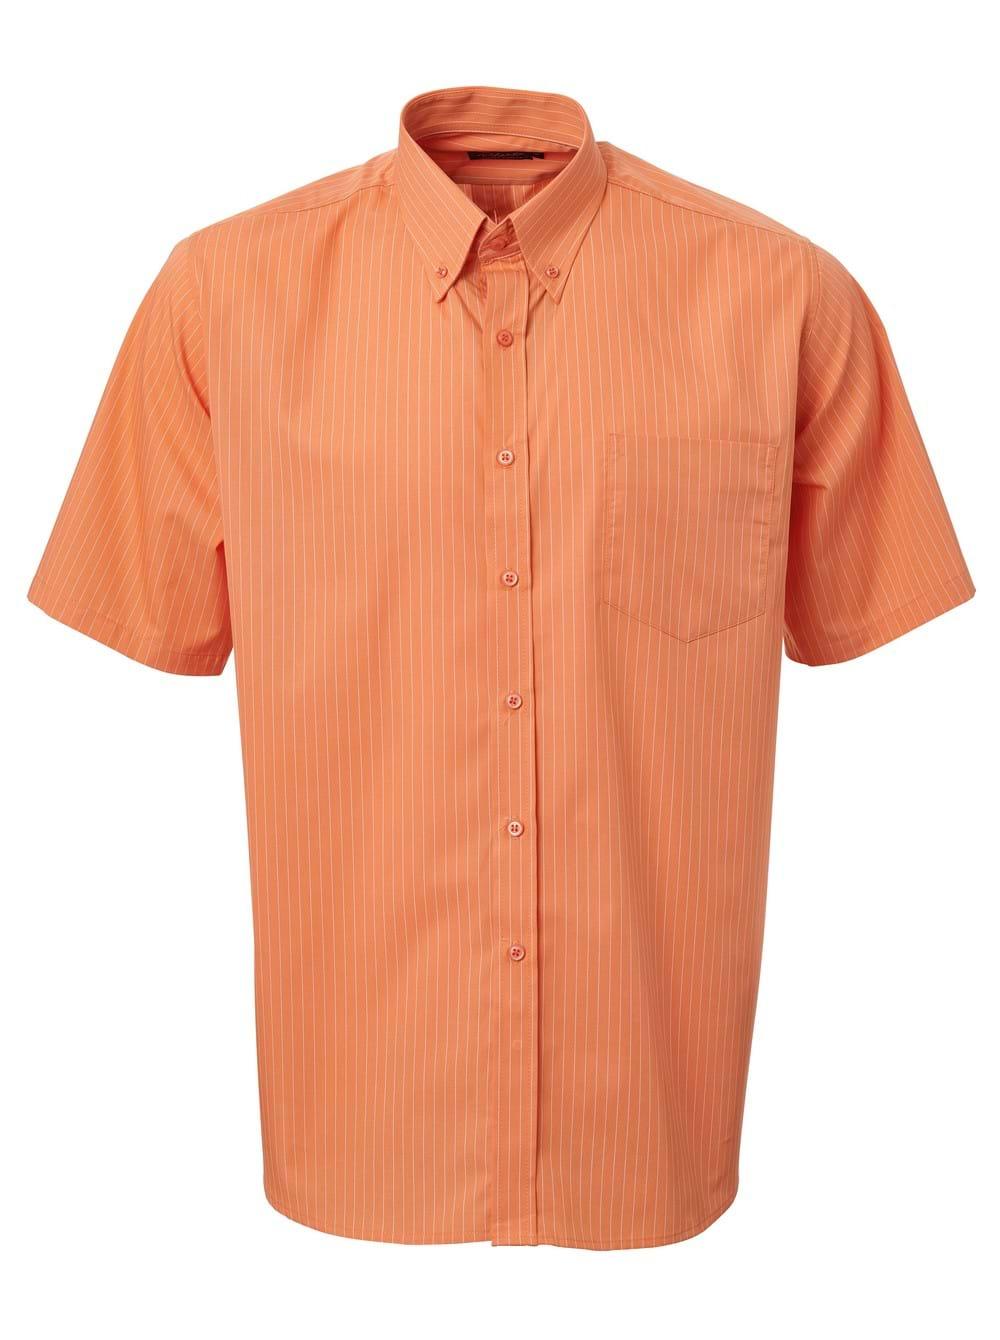 Mens Stripe Short Sleeve Shirt Tangerine